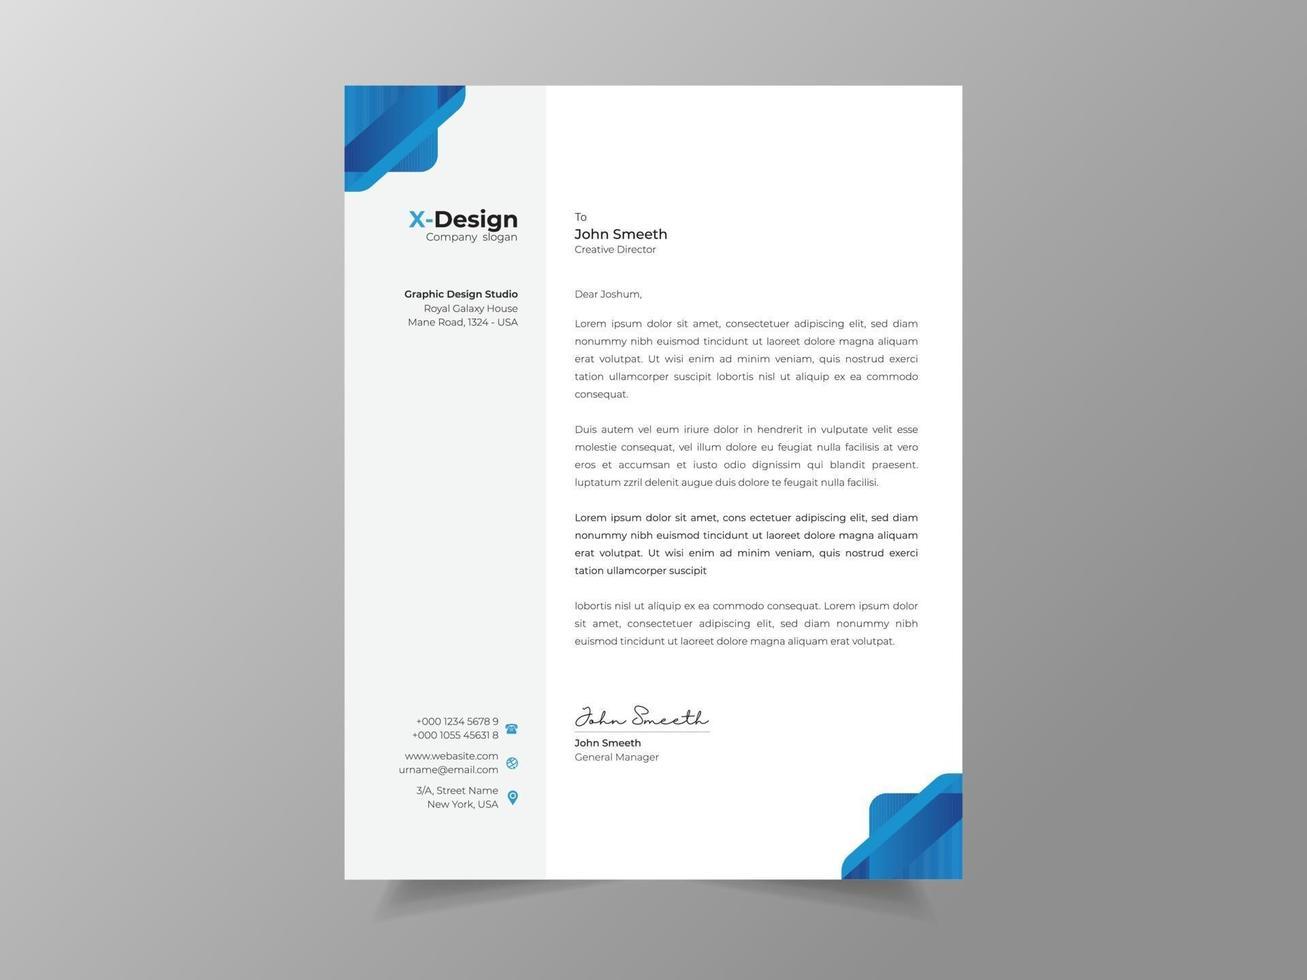 modelo de papel timbrado empresarial moderno e criativo vetor